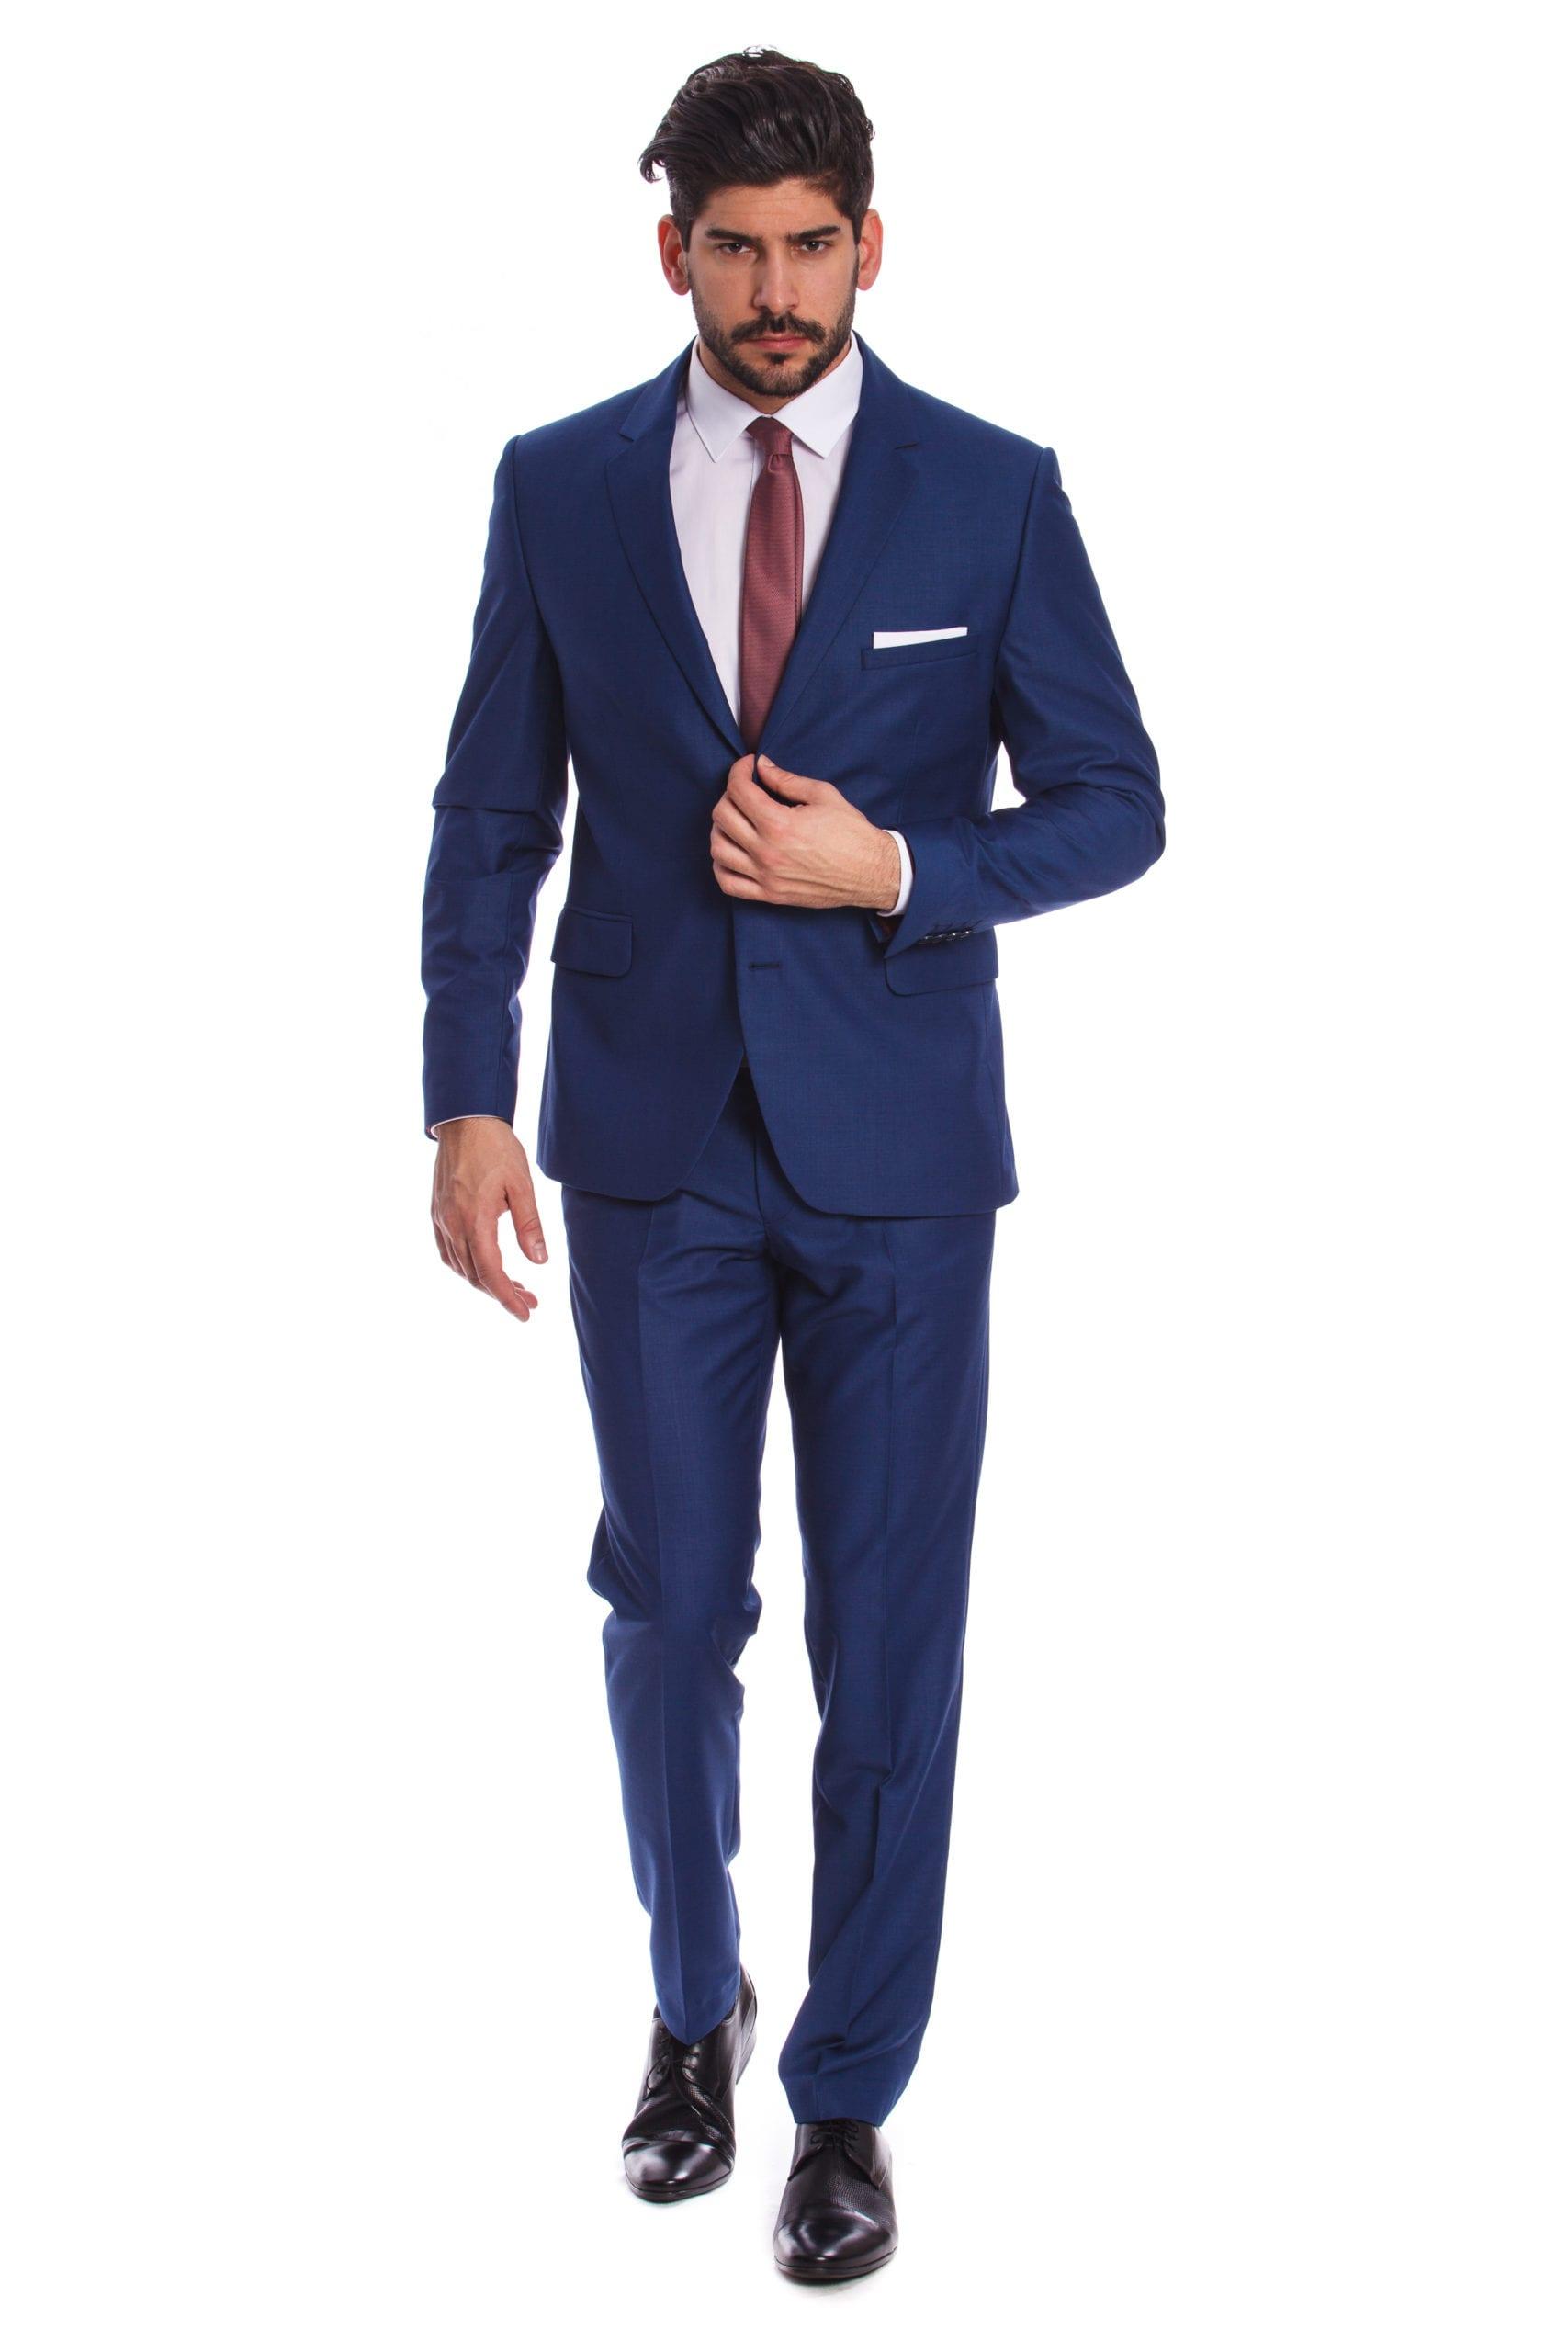 90e1341998 Palermo Kék Slim Fit Öltöny - Elite Fashion Öltönyház